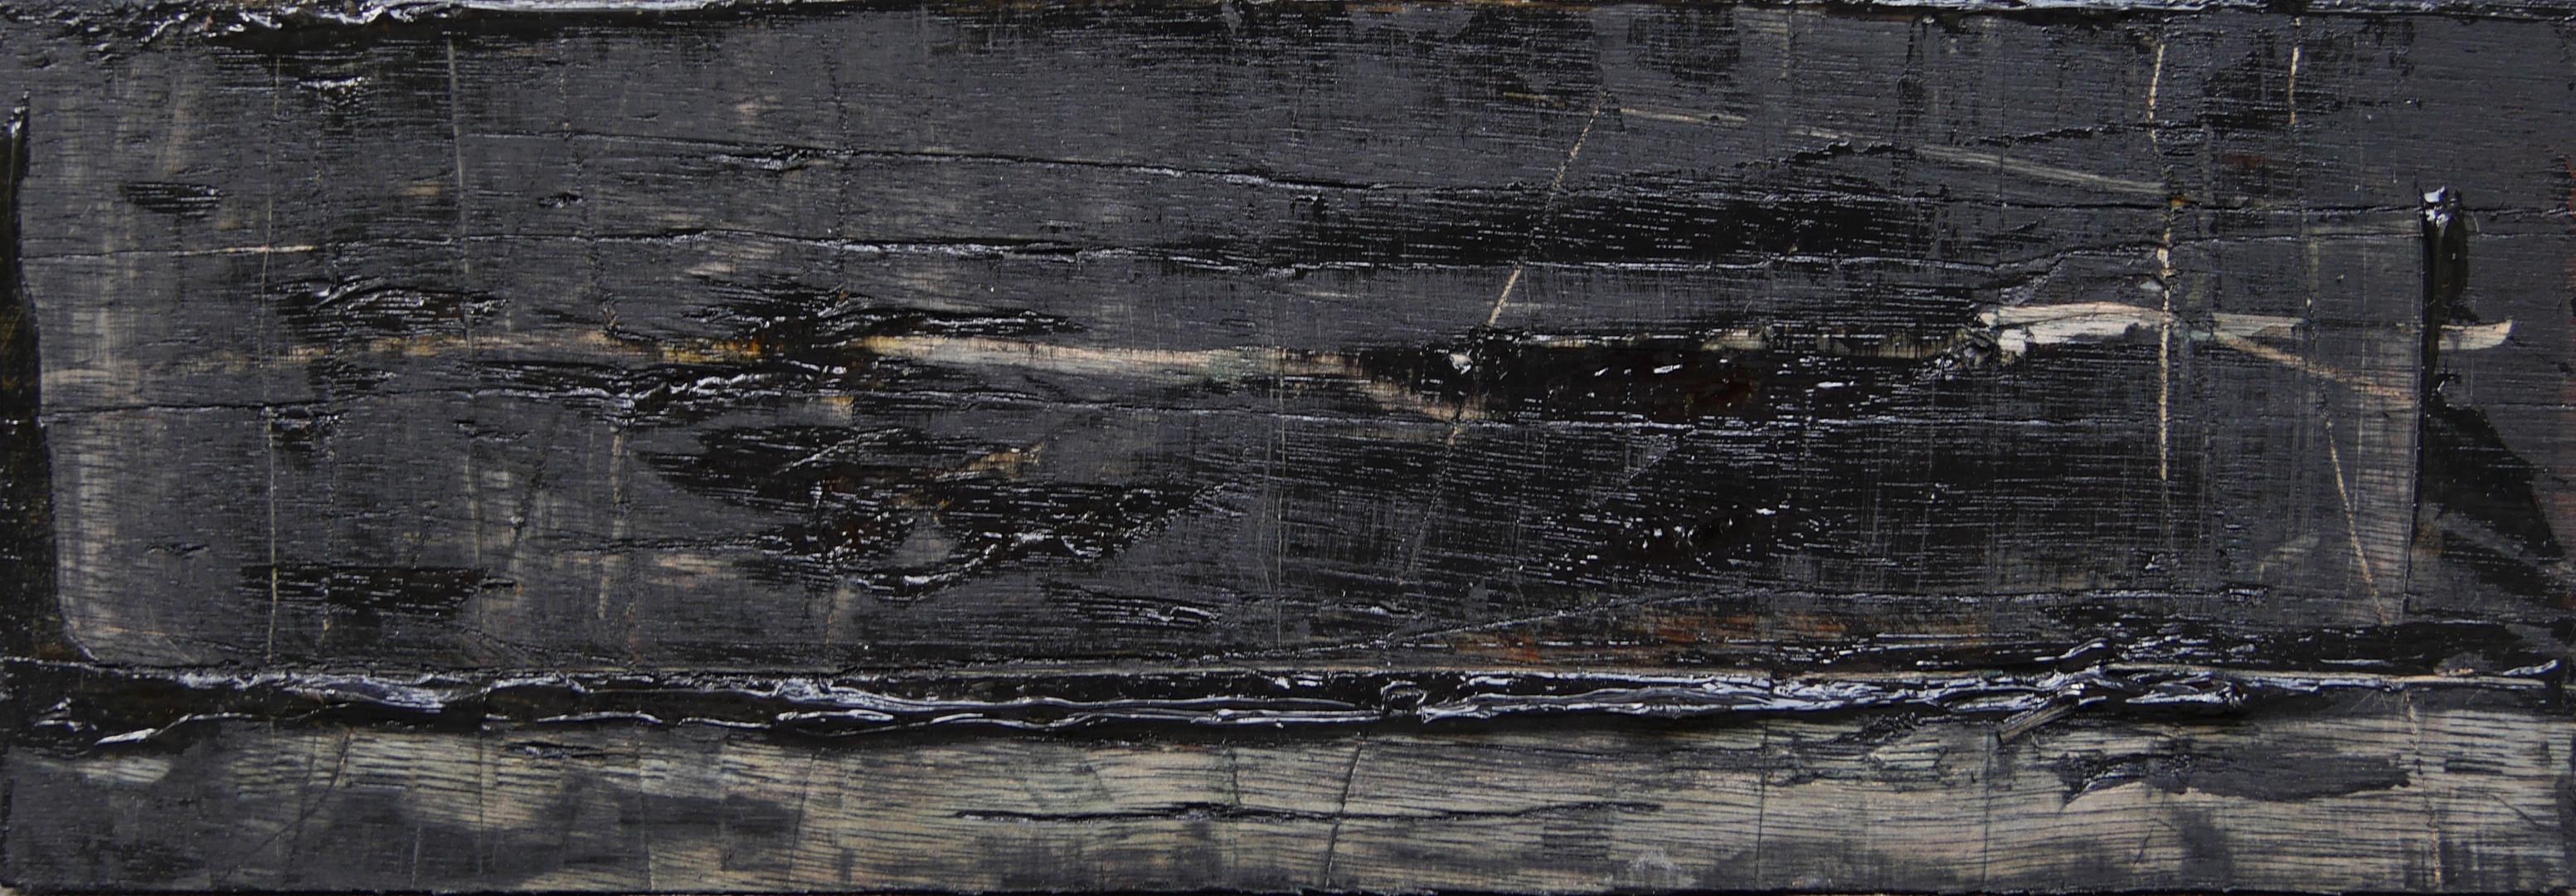 风景 IV (paysages) 10x32 cm.jpg